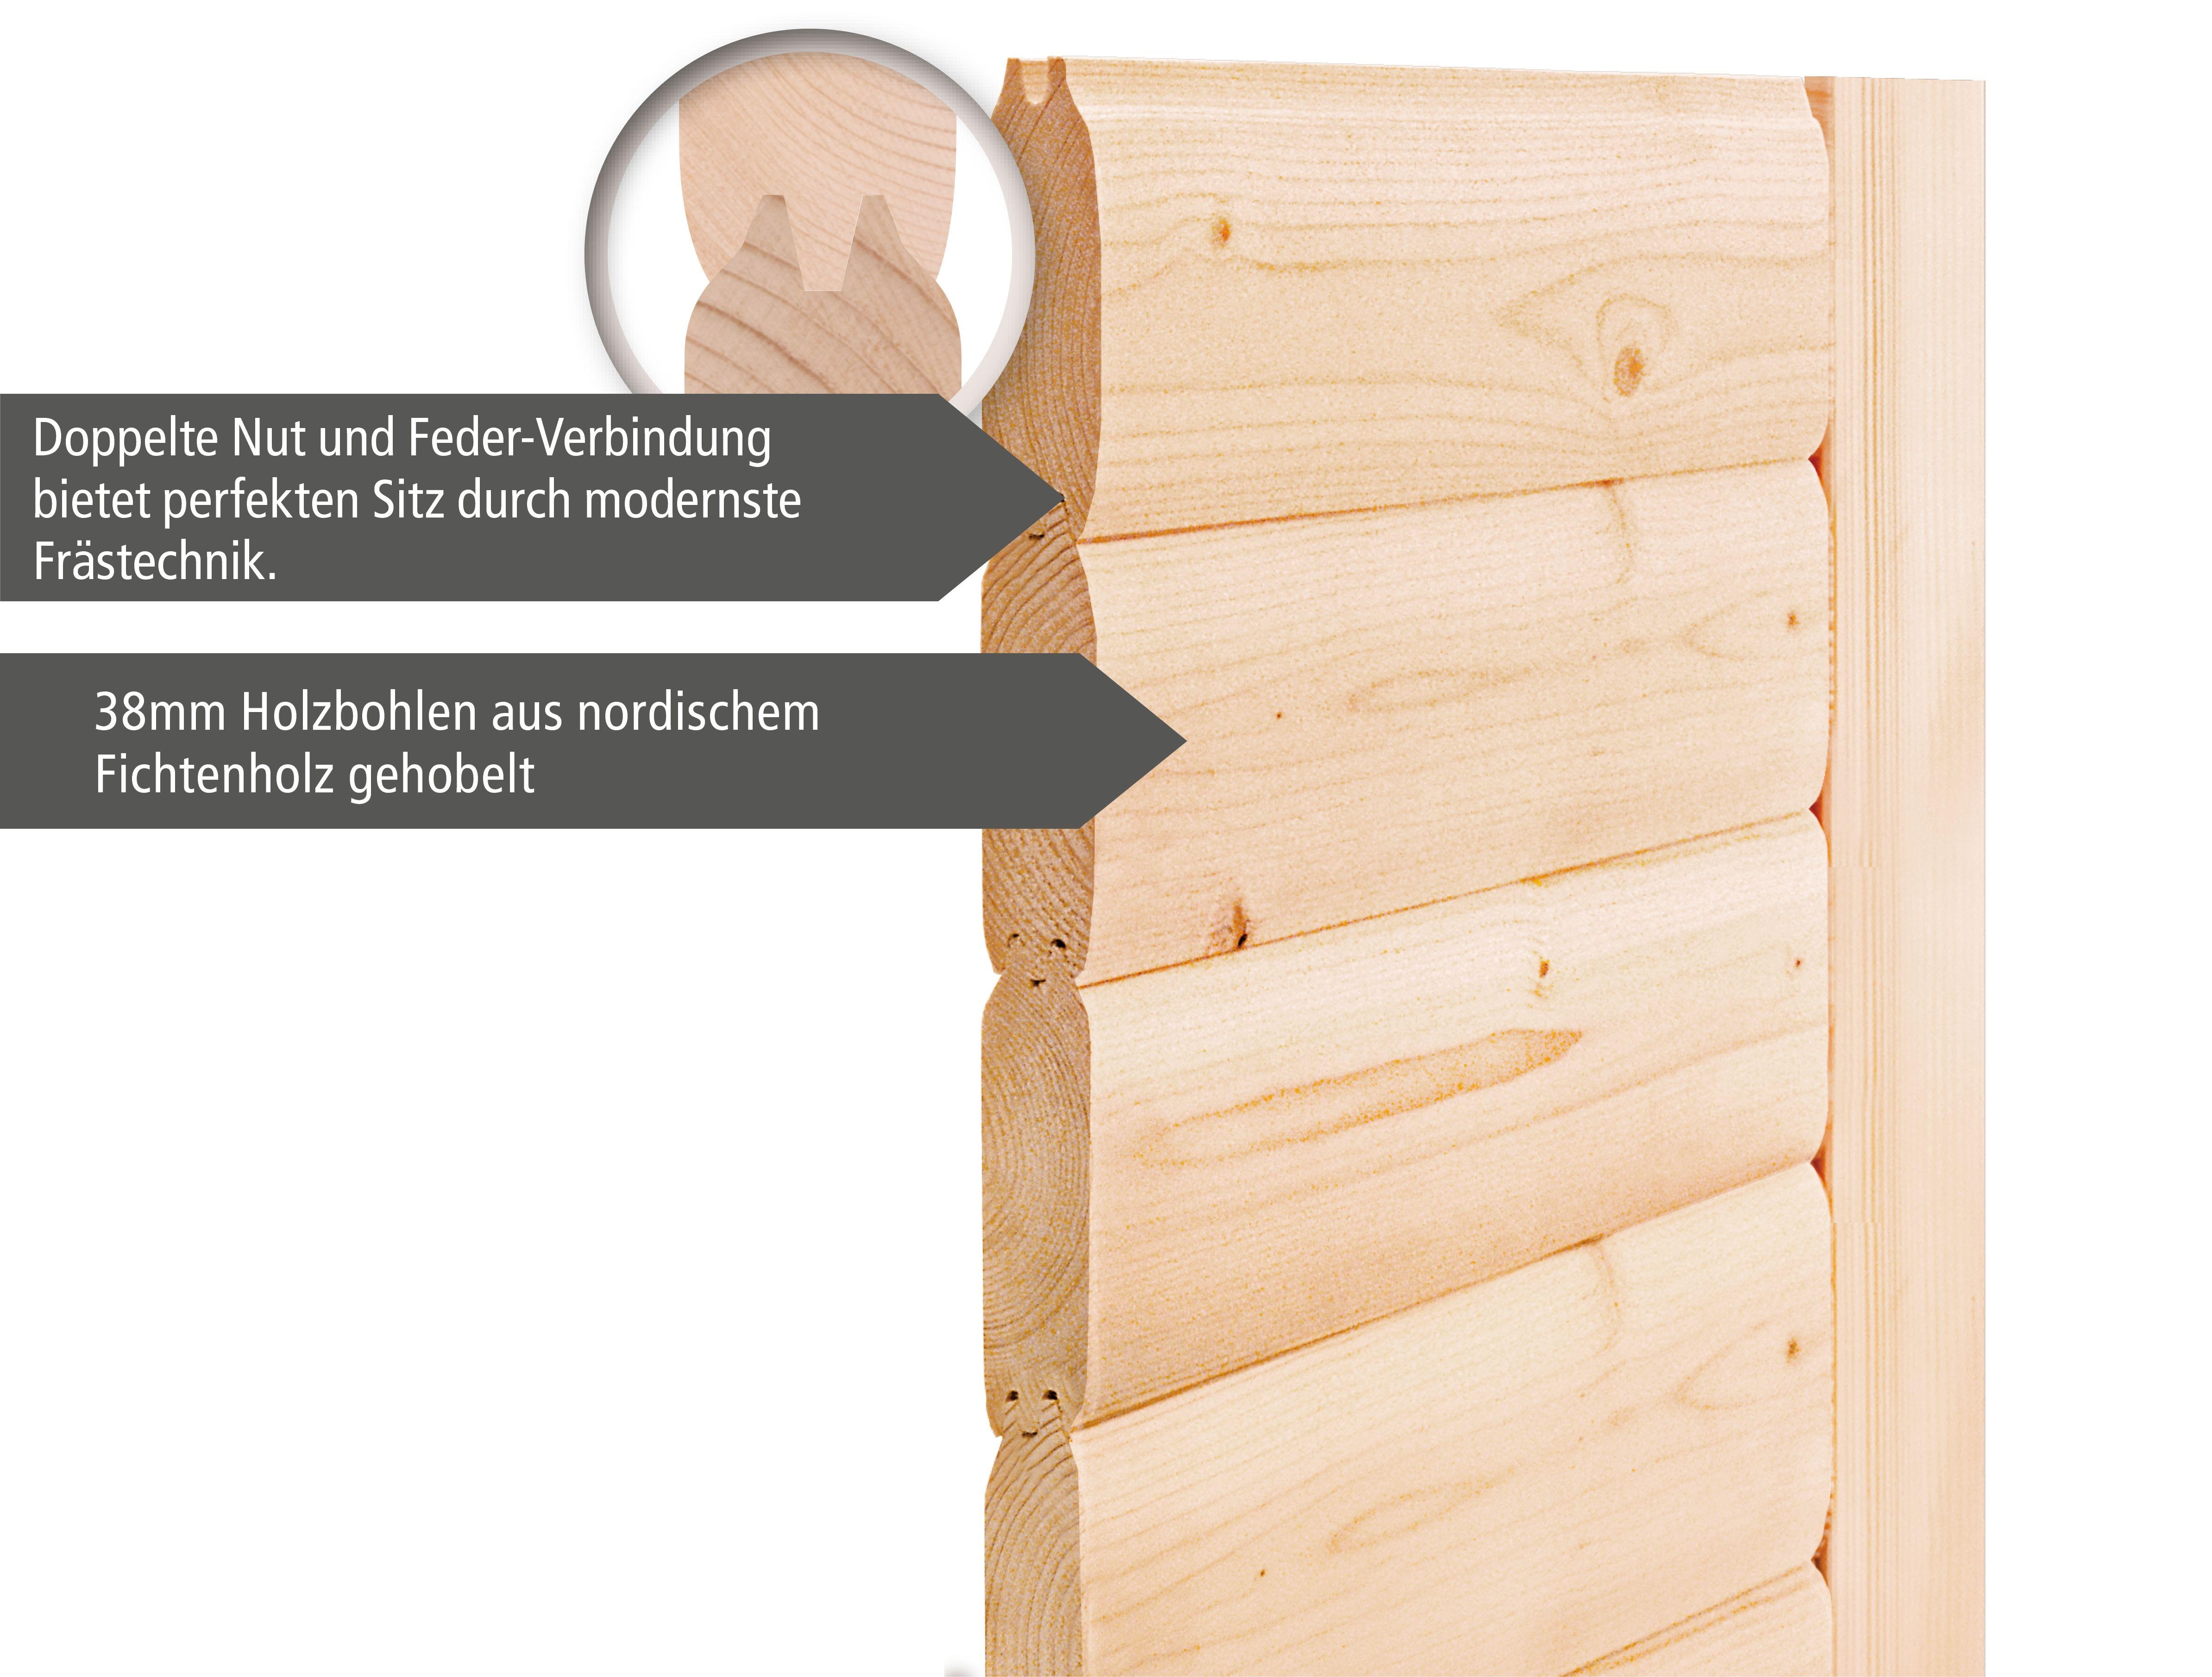 Woodfeeling Sauna Lotta 38mm Dachkranz Bio Saunaofen 9 kW extern Bild 6